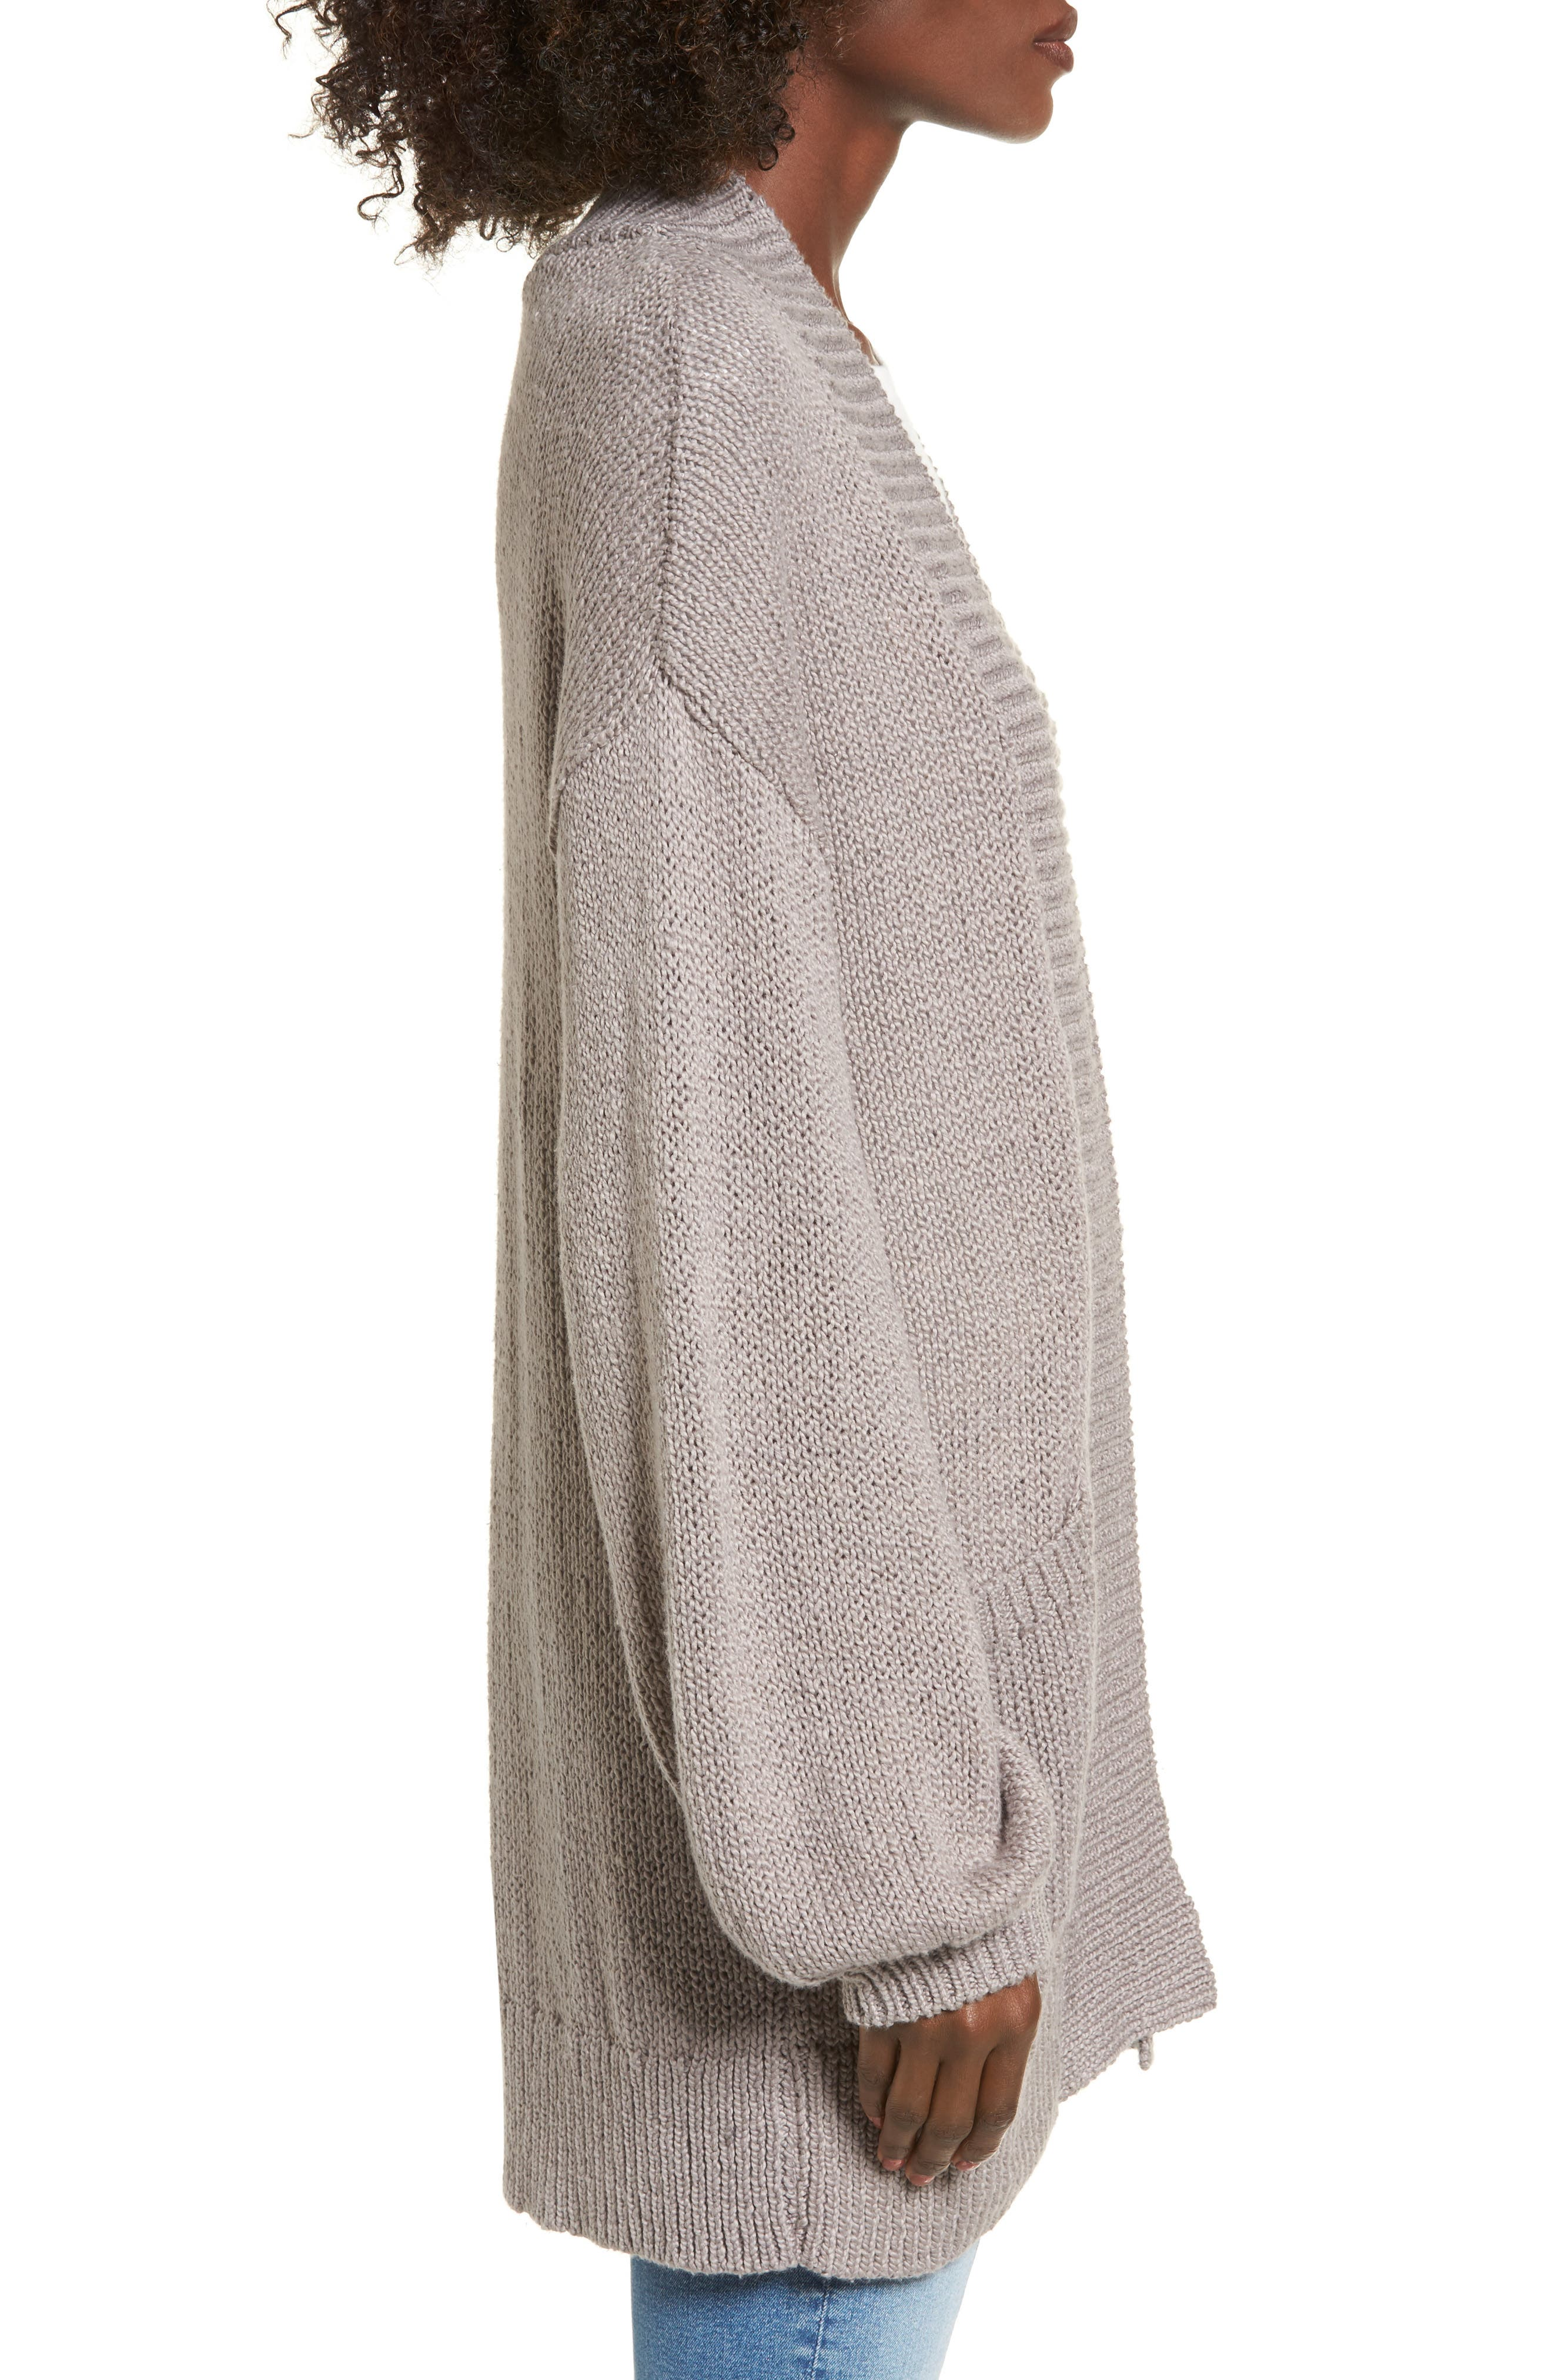 Blouson Sleeve Knit Cardigan,                             Alternate thumbnail 3, color,                             030